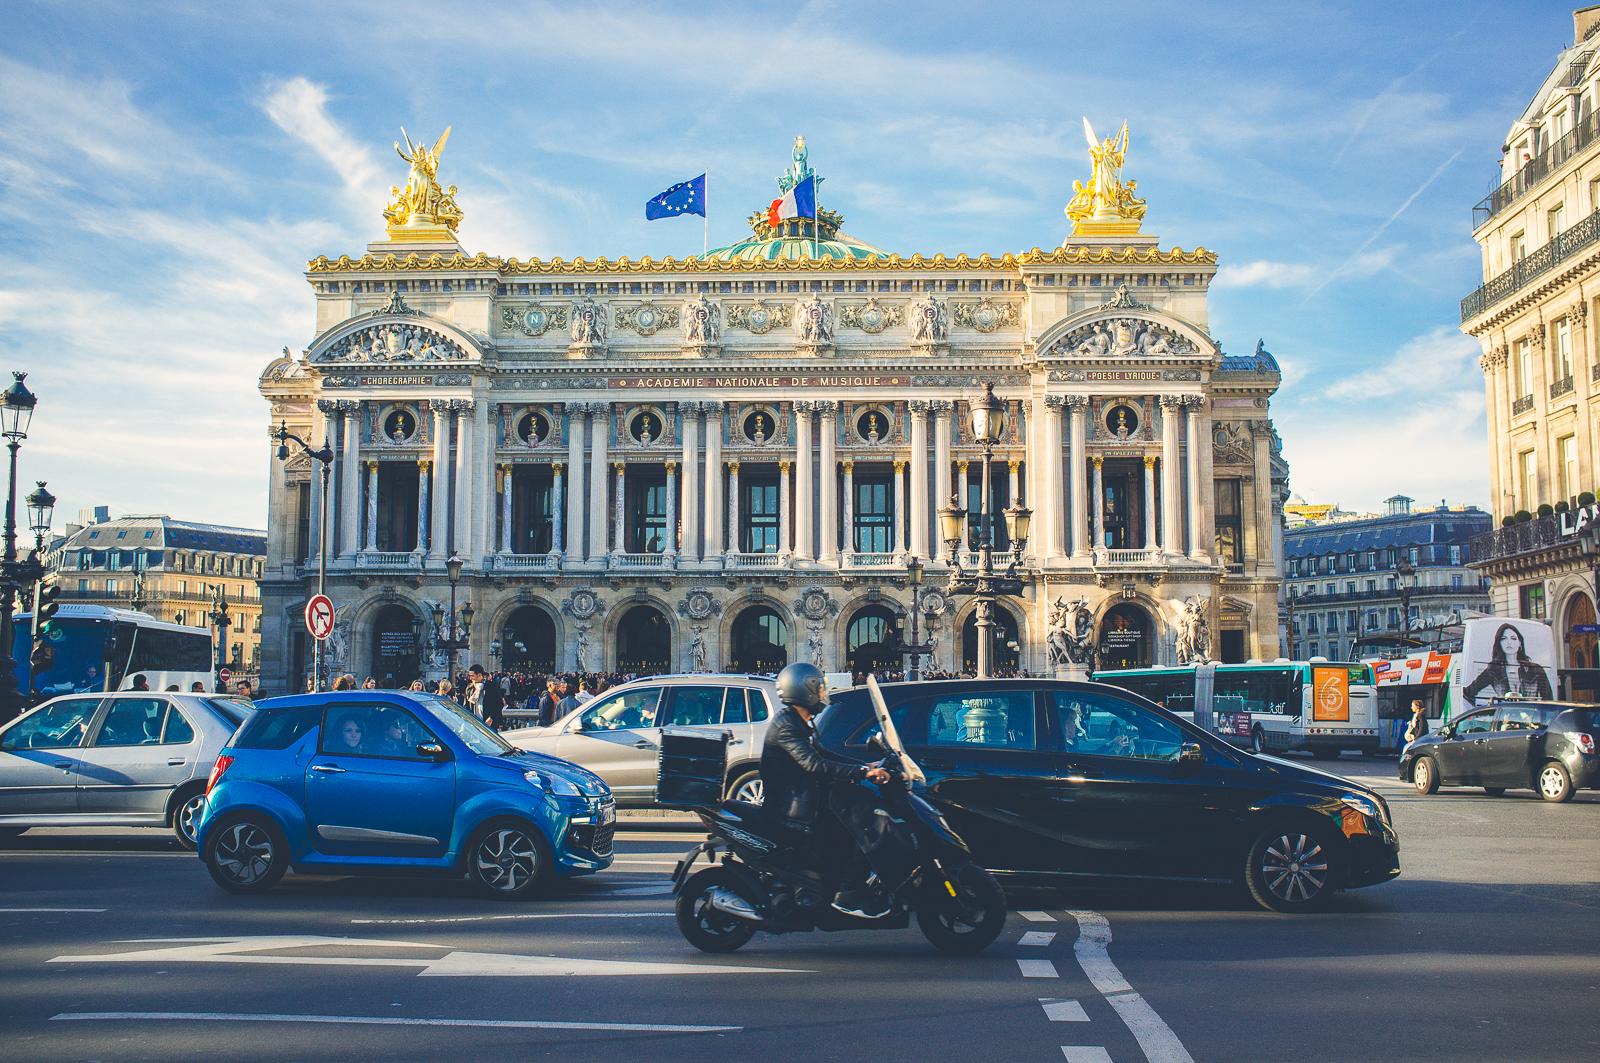 Paris at the Opera